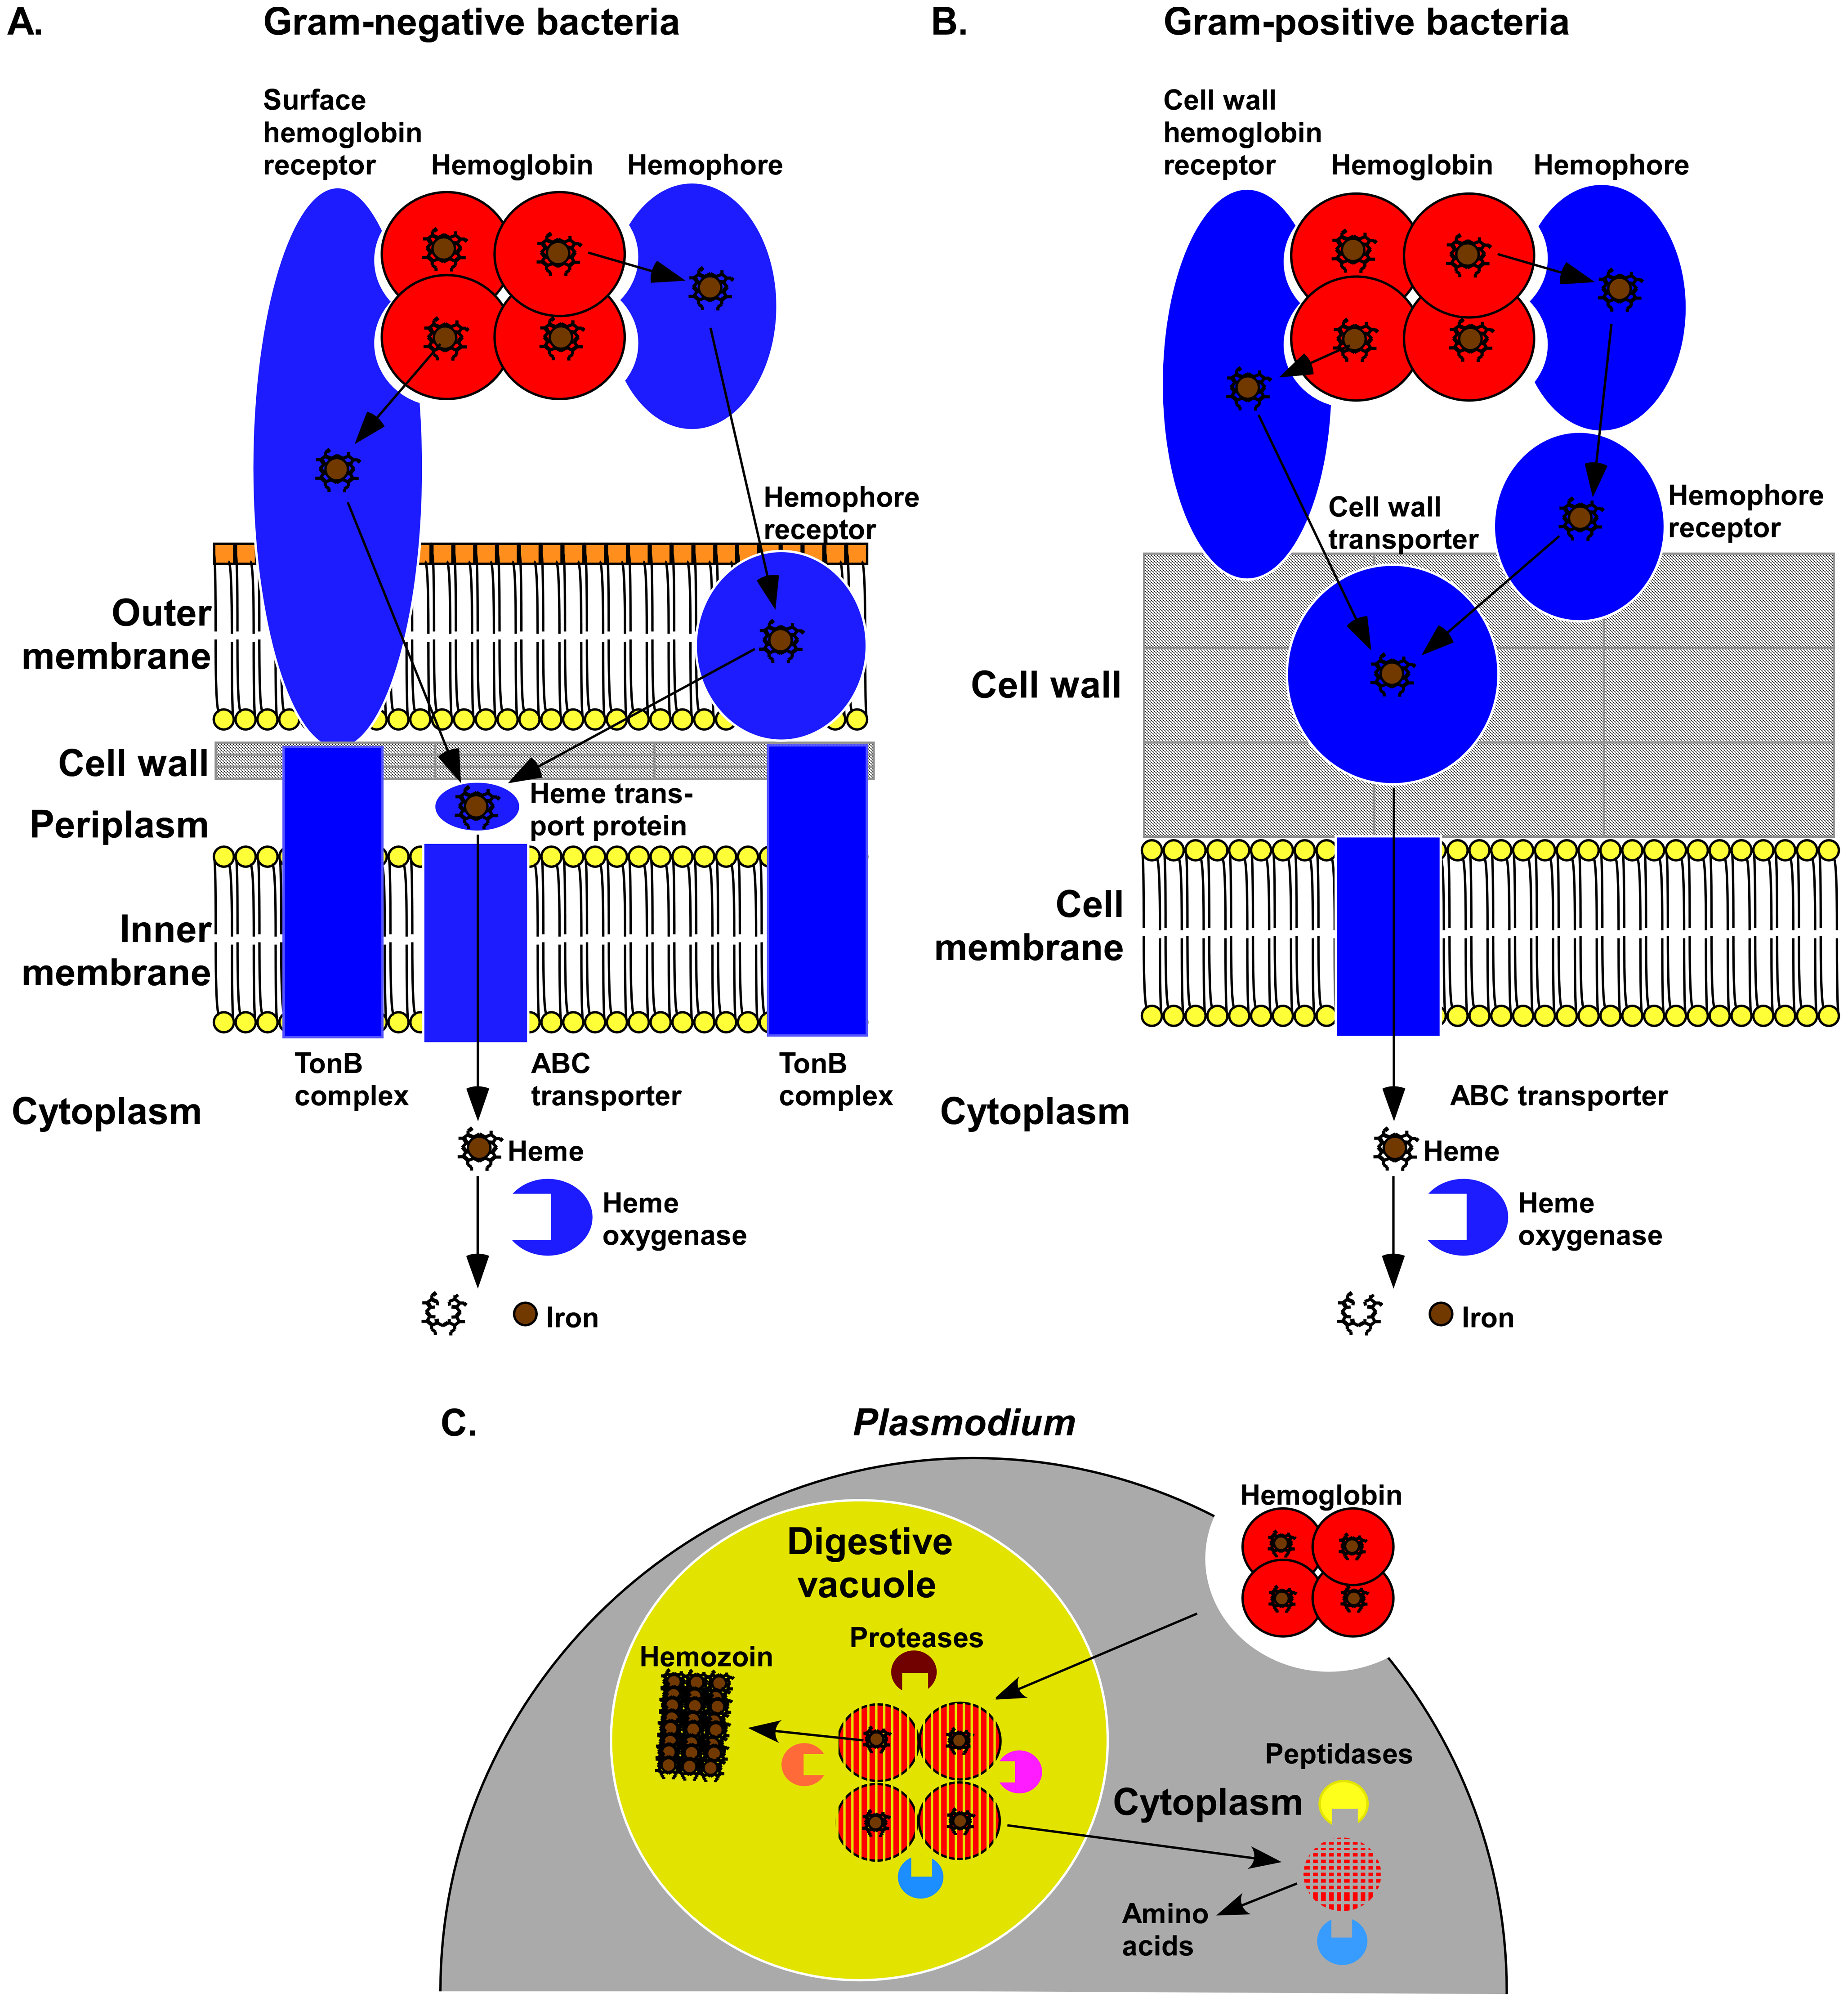 Mechanisms of hemoglobin utilization by pathogens.